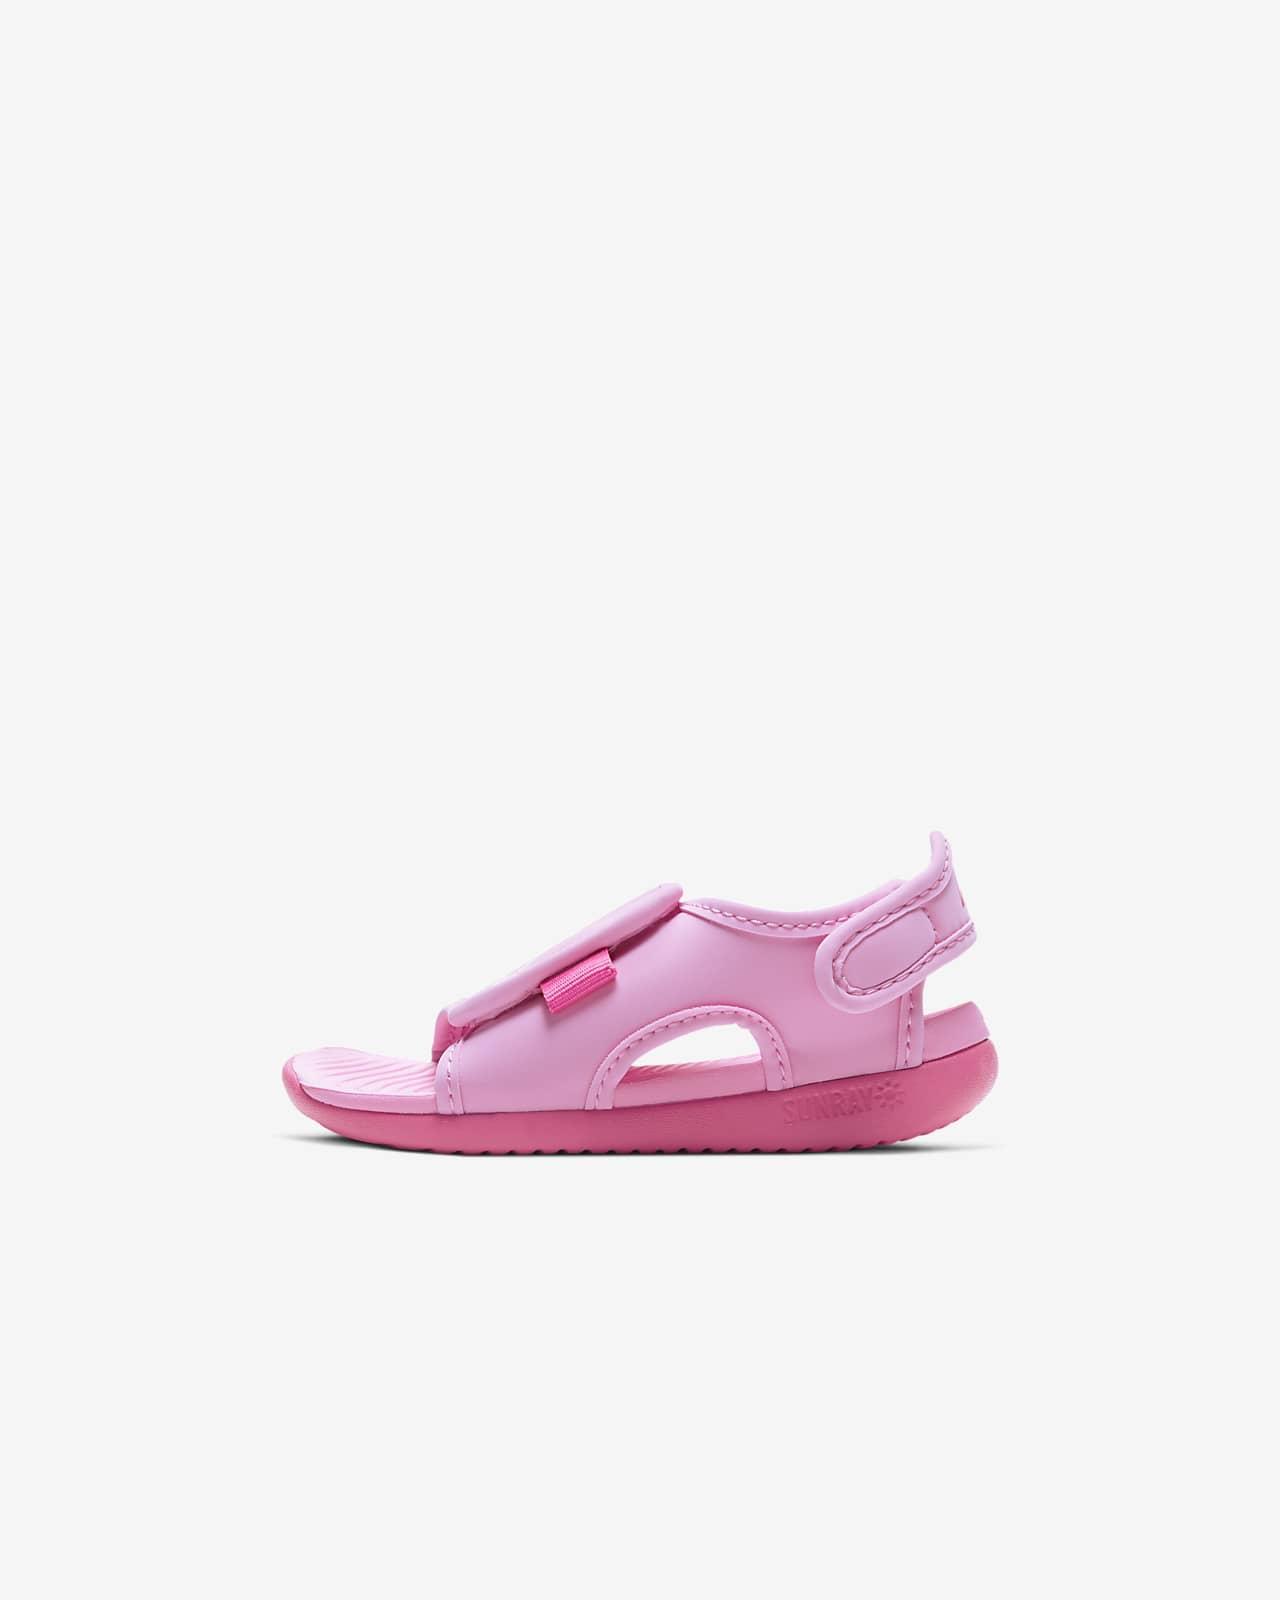 Nike Sunray Adjust 5 V2 嬰幼兒涼鞋